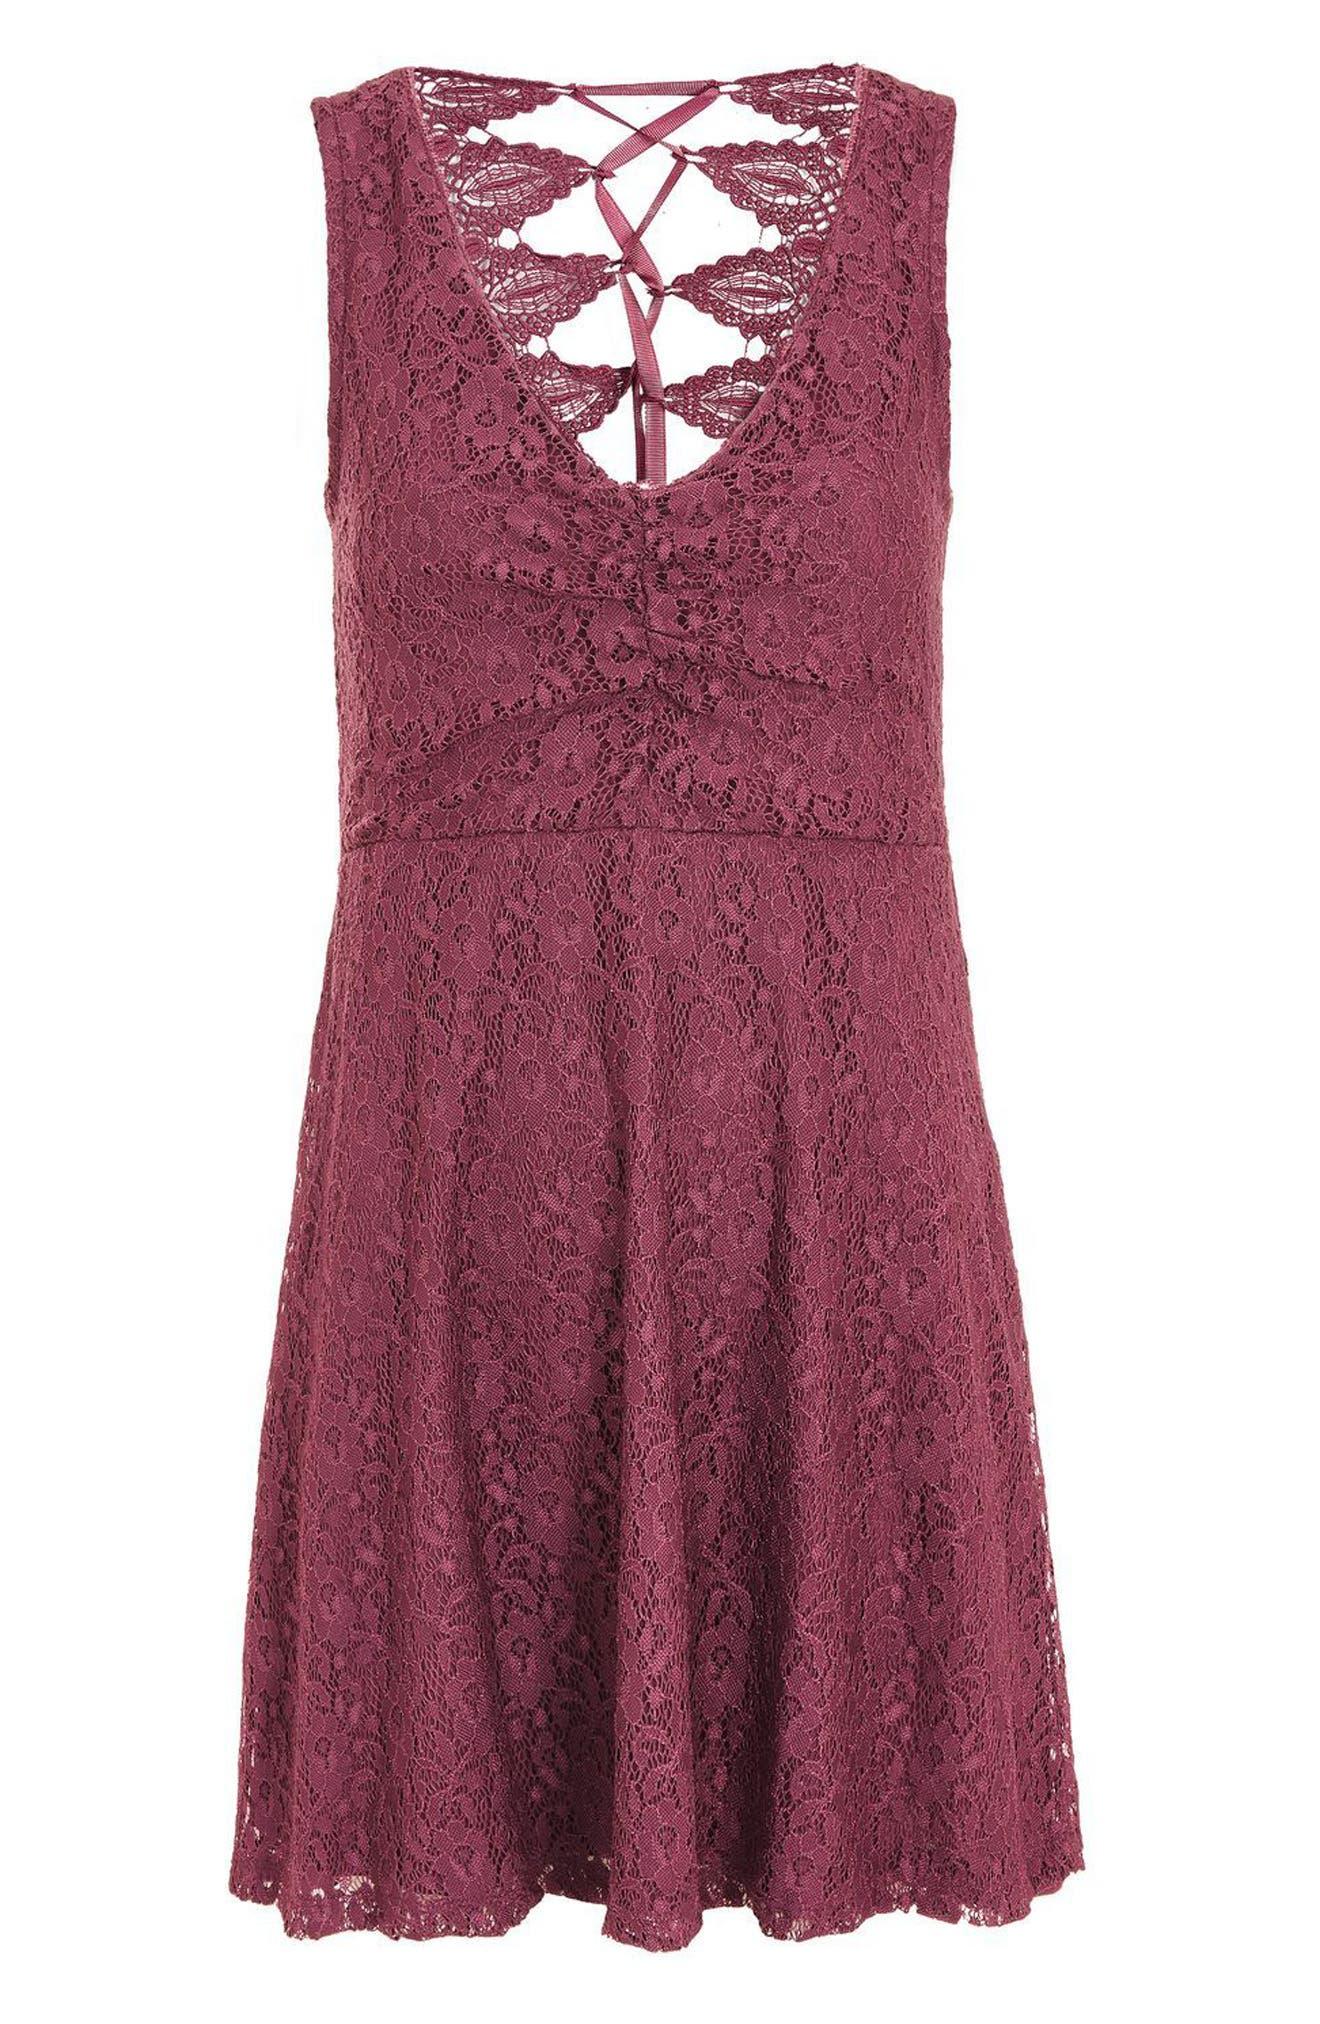 Lace-Up Lace Skater Dress,                             Alternate thumbnail 4, color,                             500